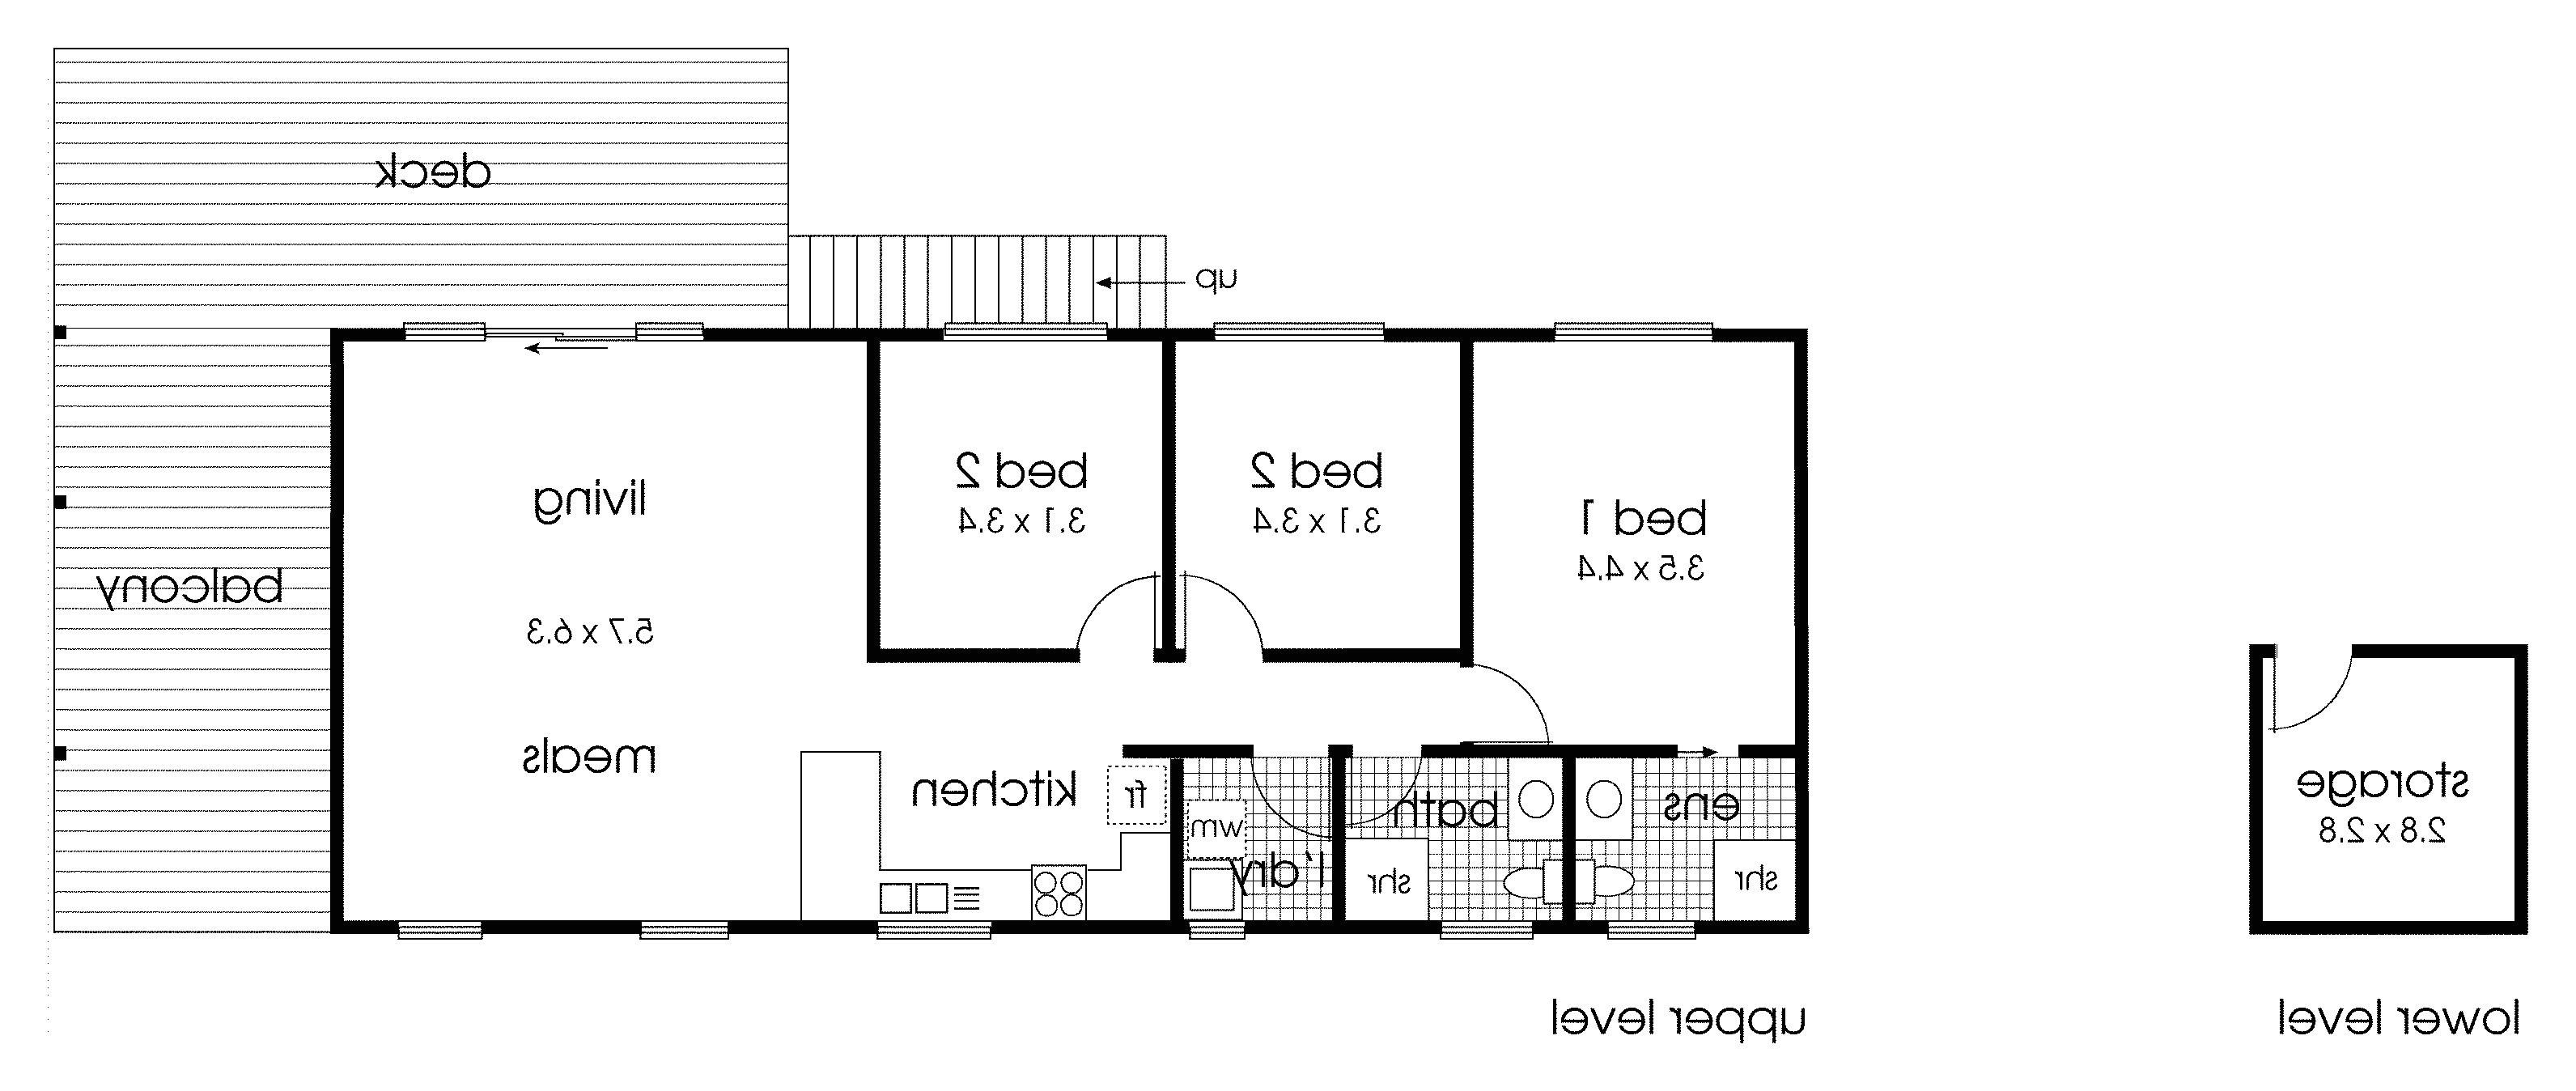 20 elegant oak creek homes floor plans oak creek homes floor plans fresh ada home floor